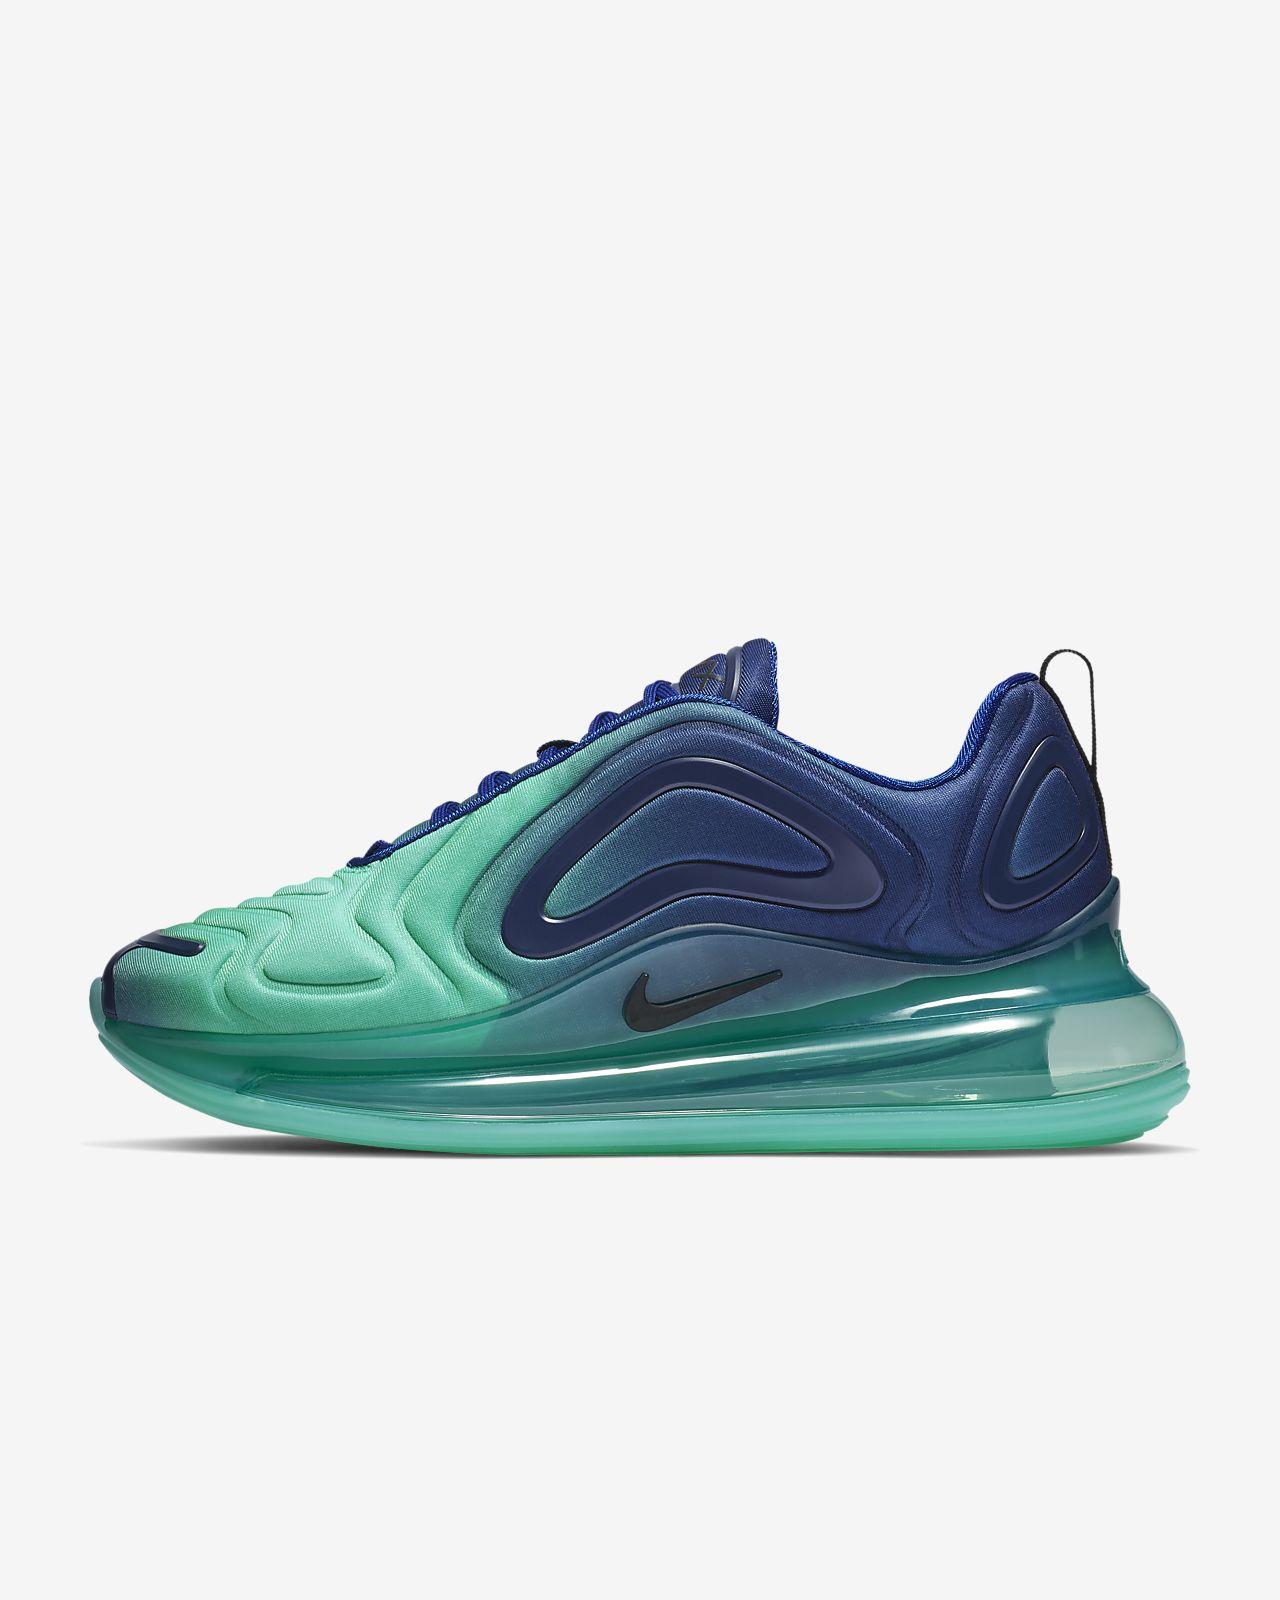 Buty Nike Air Jordan Online, Buty Nike Polska Wyprzedaż